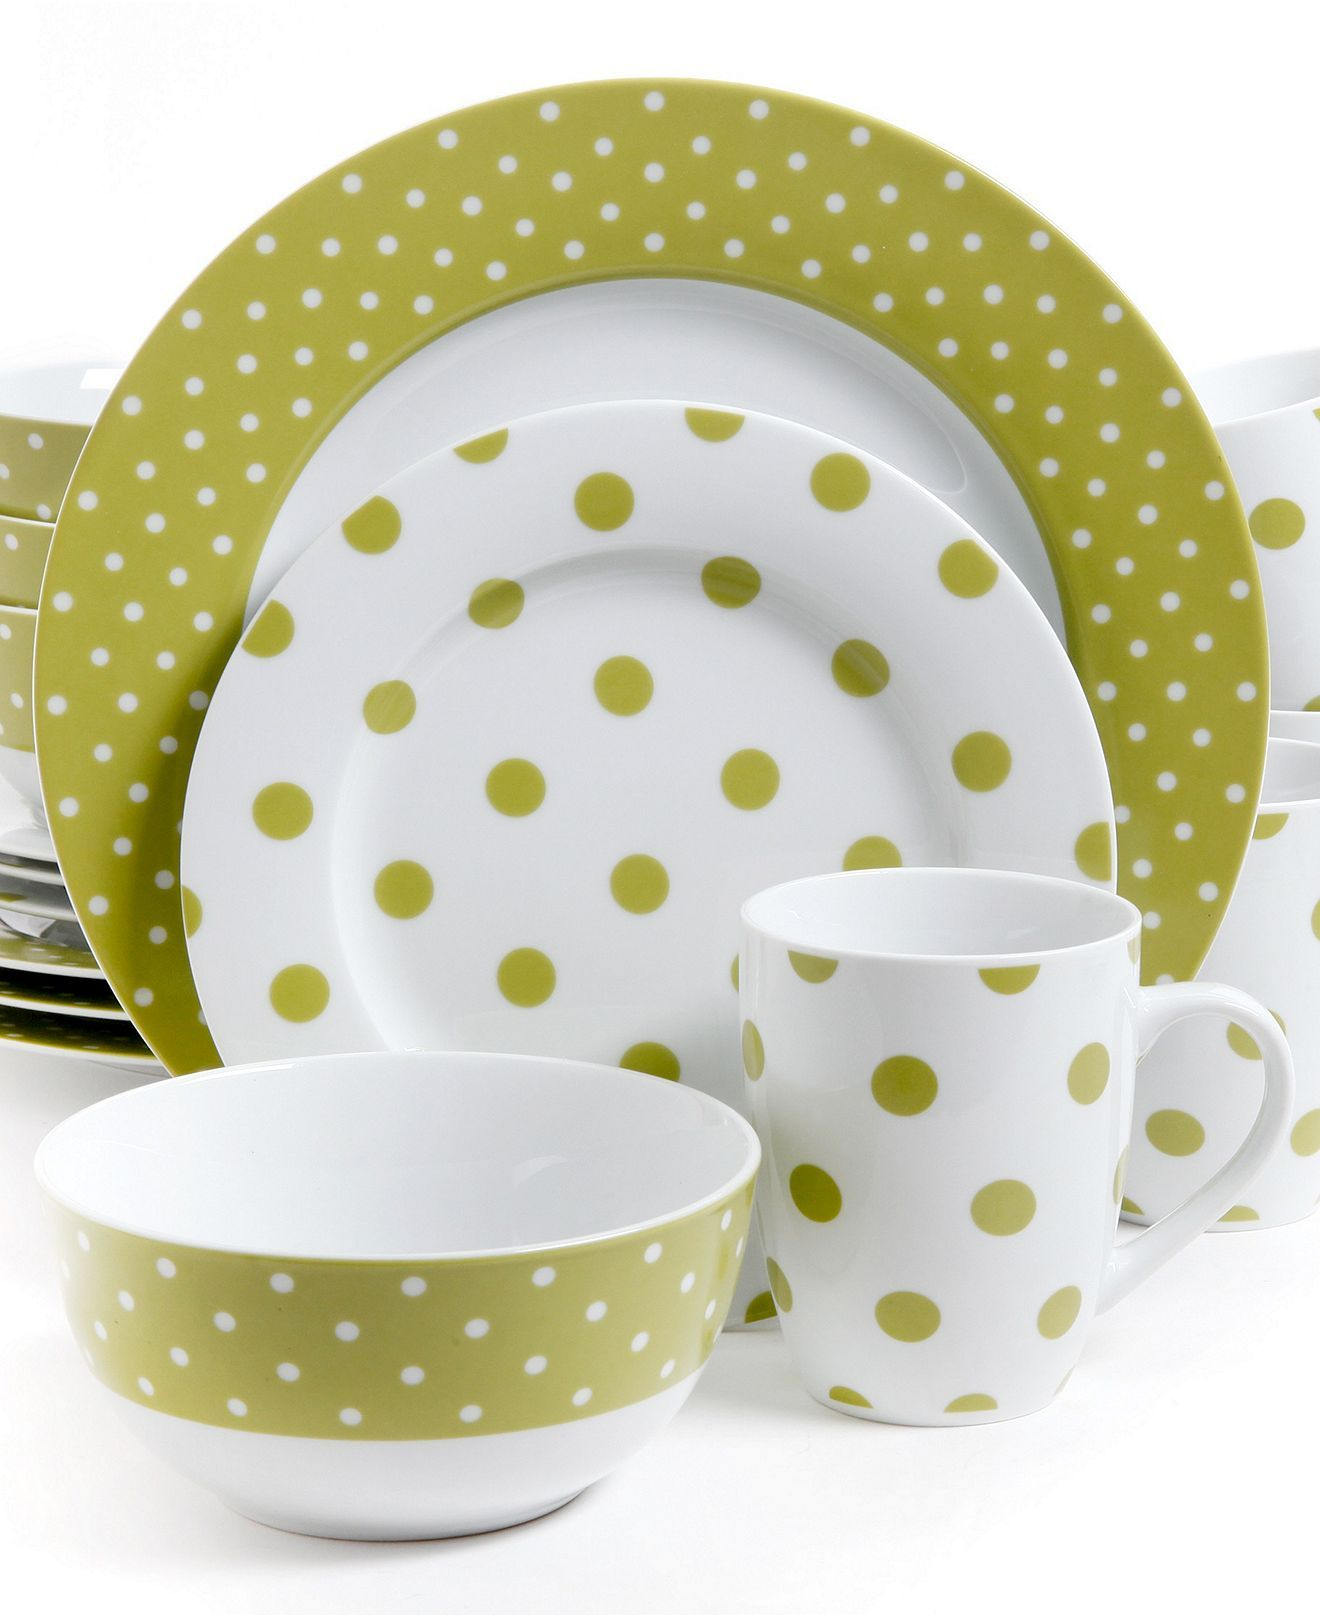 Isaac Mizrahi Dots Luxe Lime 16-Pc. Set Service for 4 - Dinnerware - Dining u0026 Entertaining - Macyu0027s  sc 1 st  Pinterest & Isaac Mizrahi Polka Dot Lime 16-Piece Set - Casual Dinnerware ...